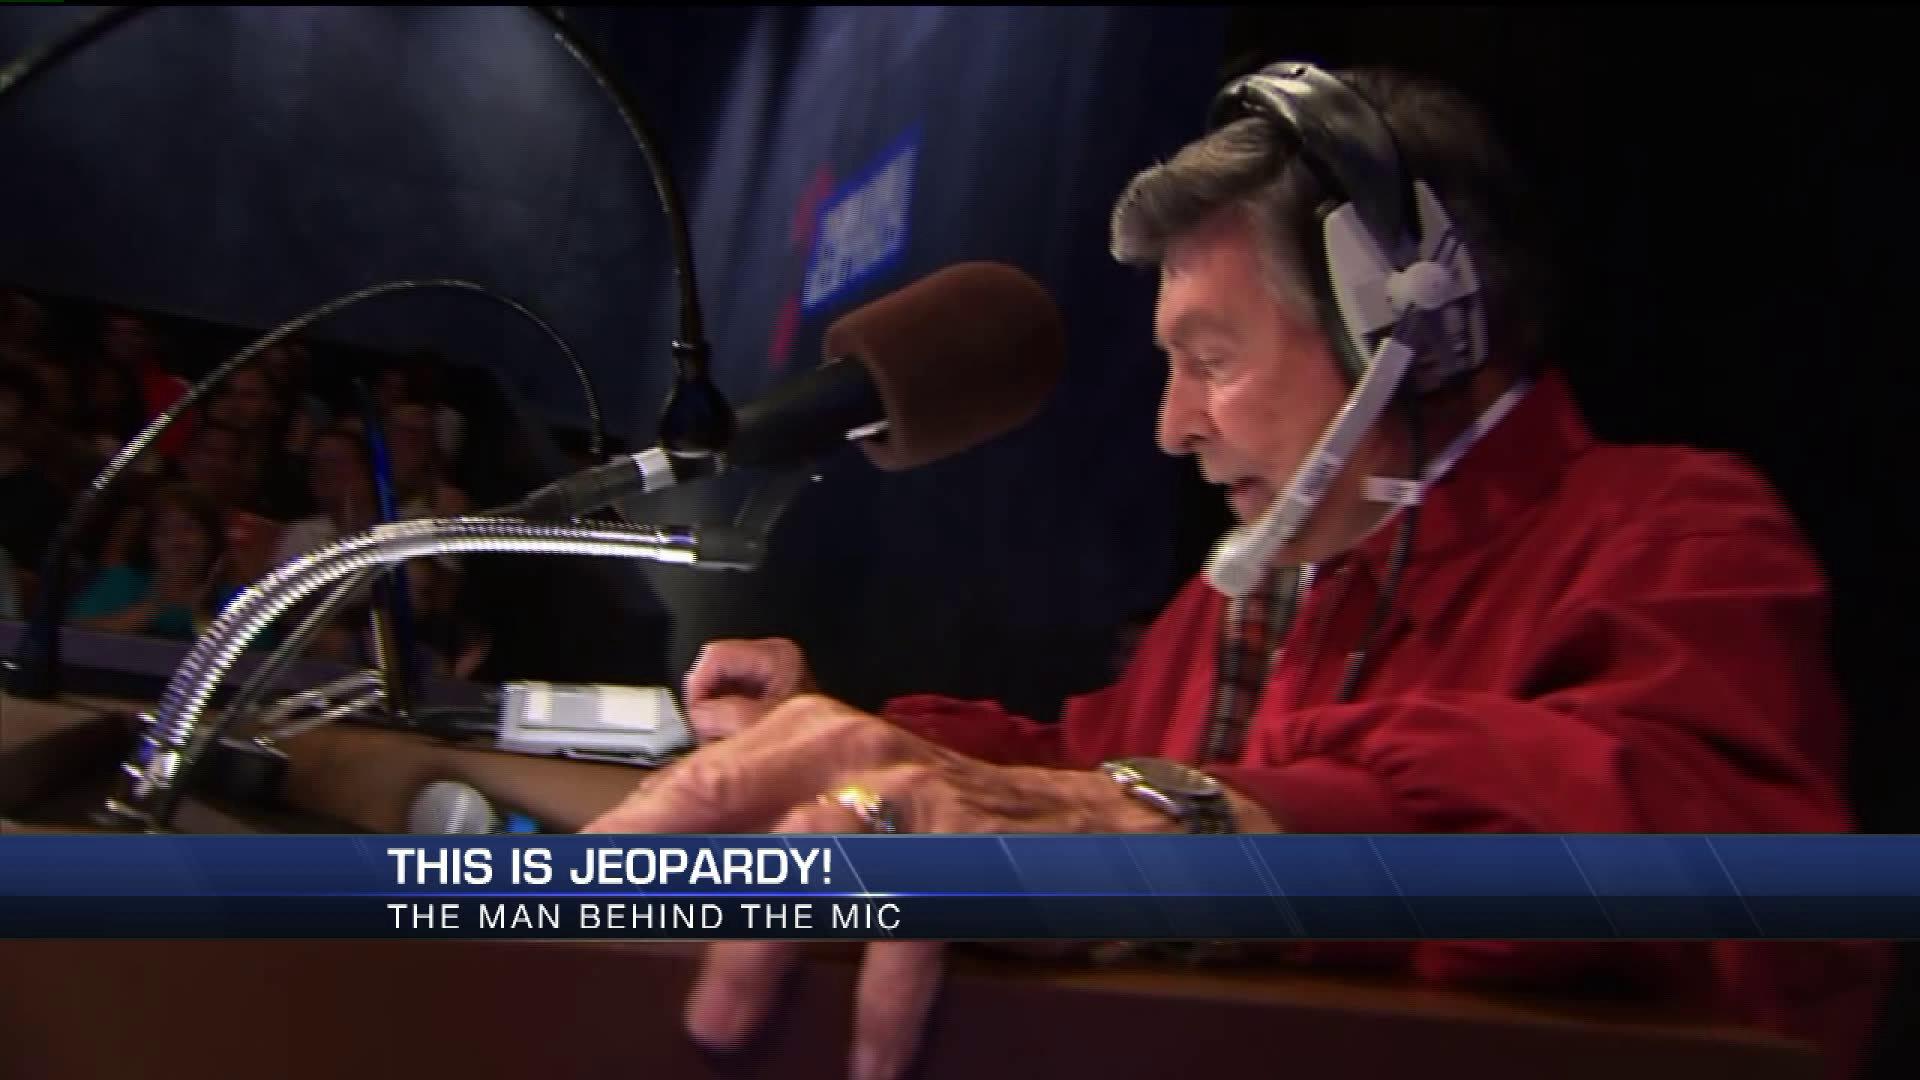 'Jeopardy! announcer Johnny Gilbert